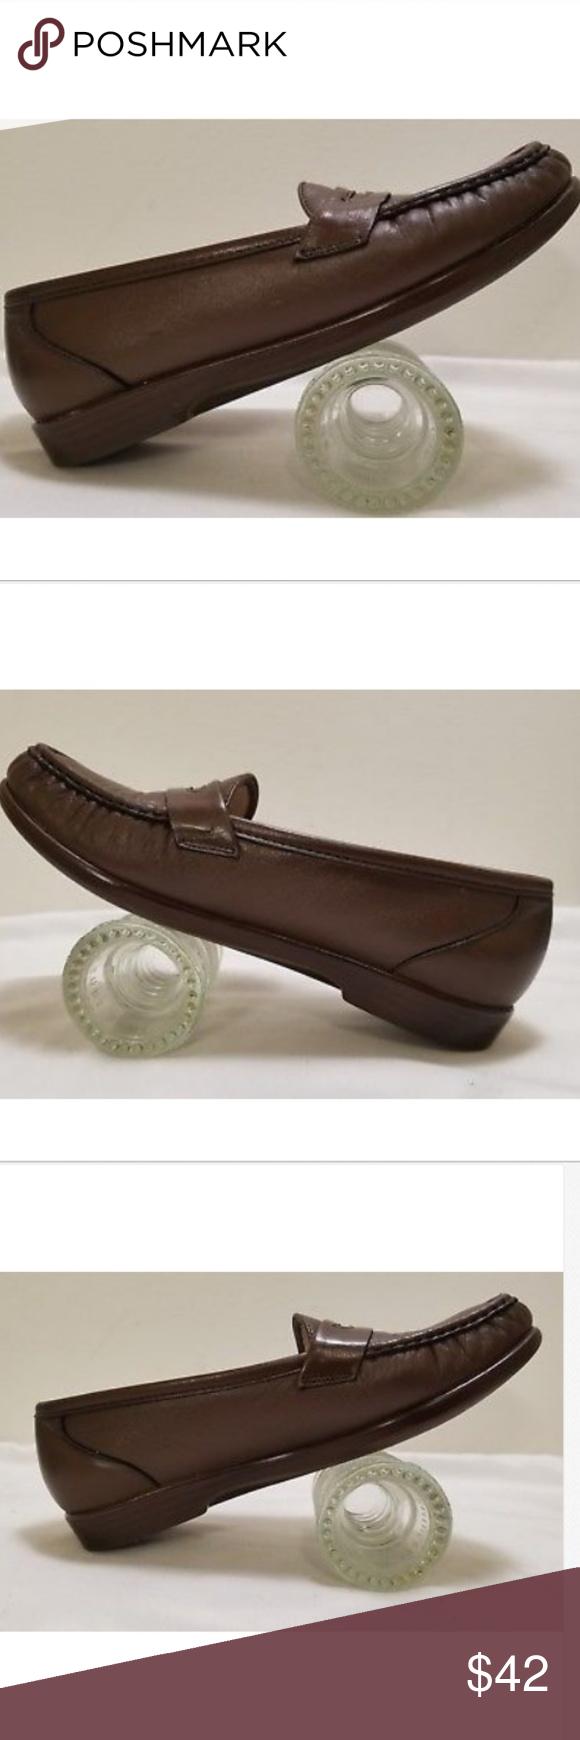 Sas tripad comfort moc toe penny loafers size m penny loafers